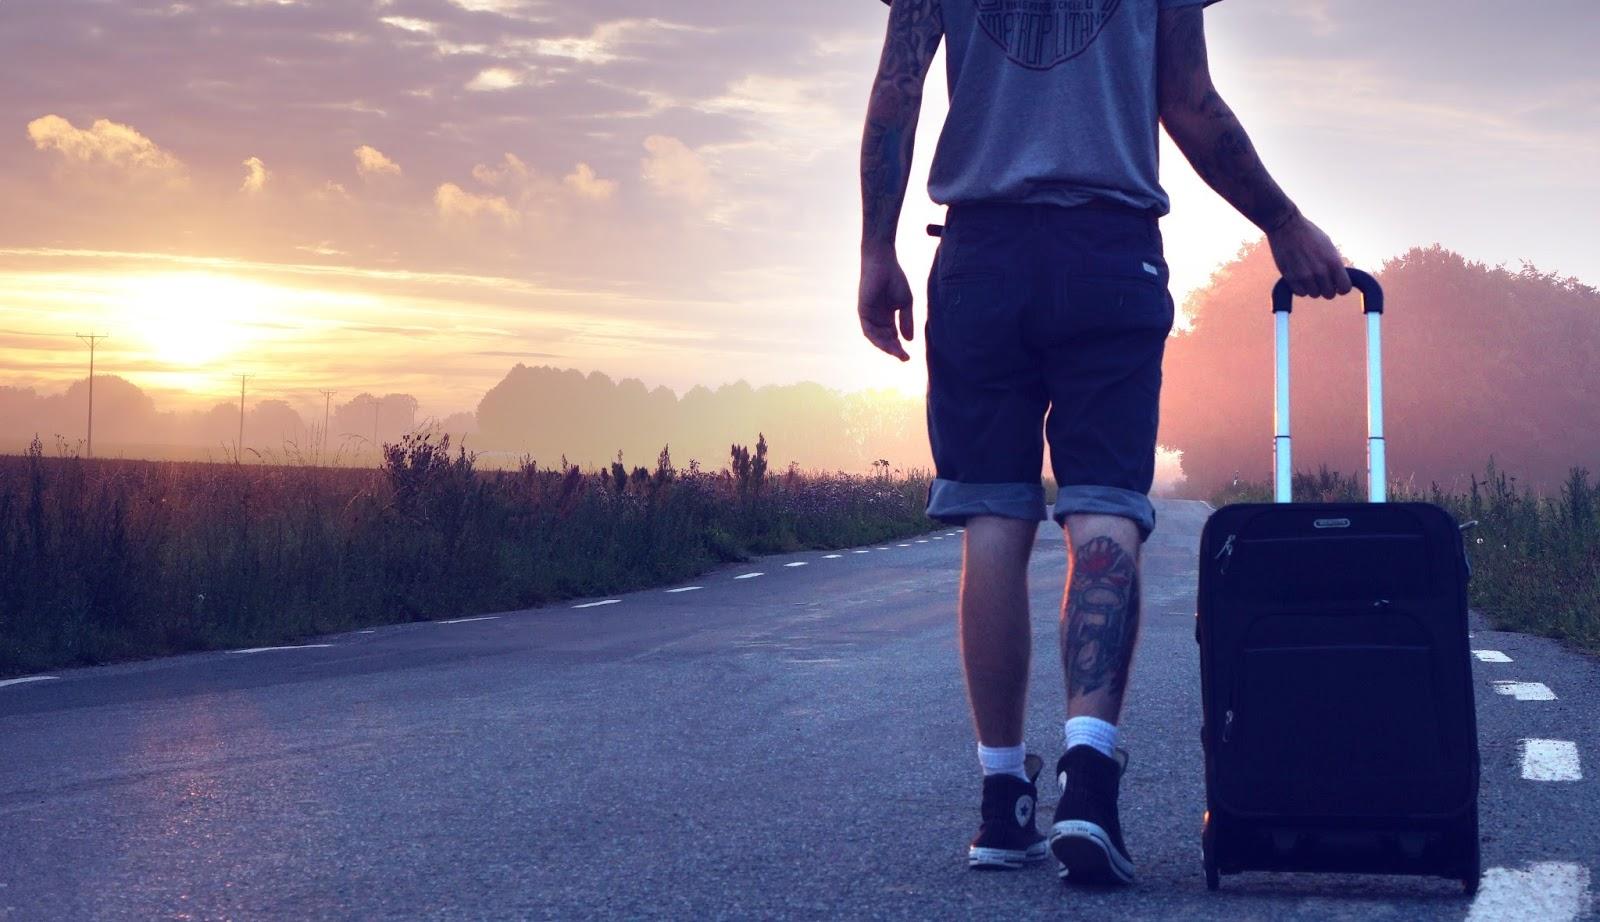 hiker travel trip wander 163688